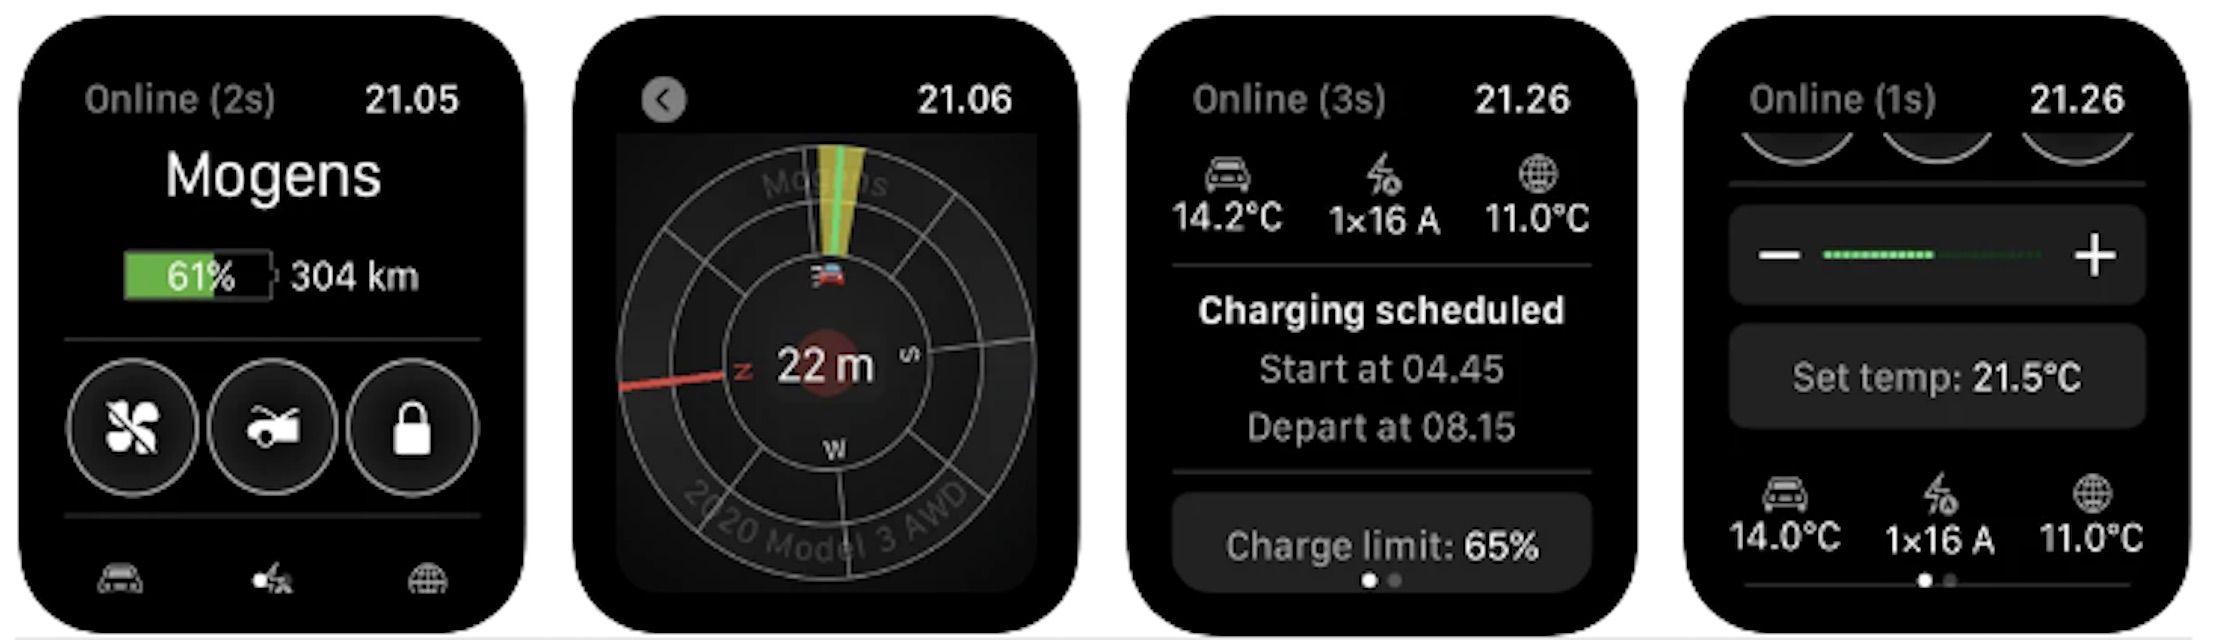 Watch App for Tesla charging indicators